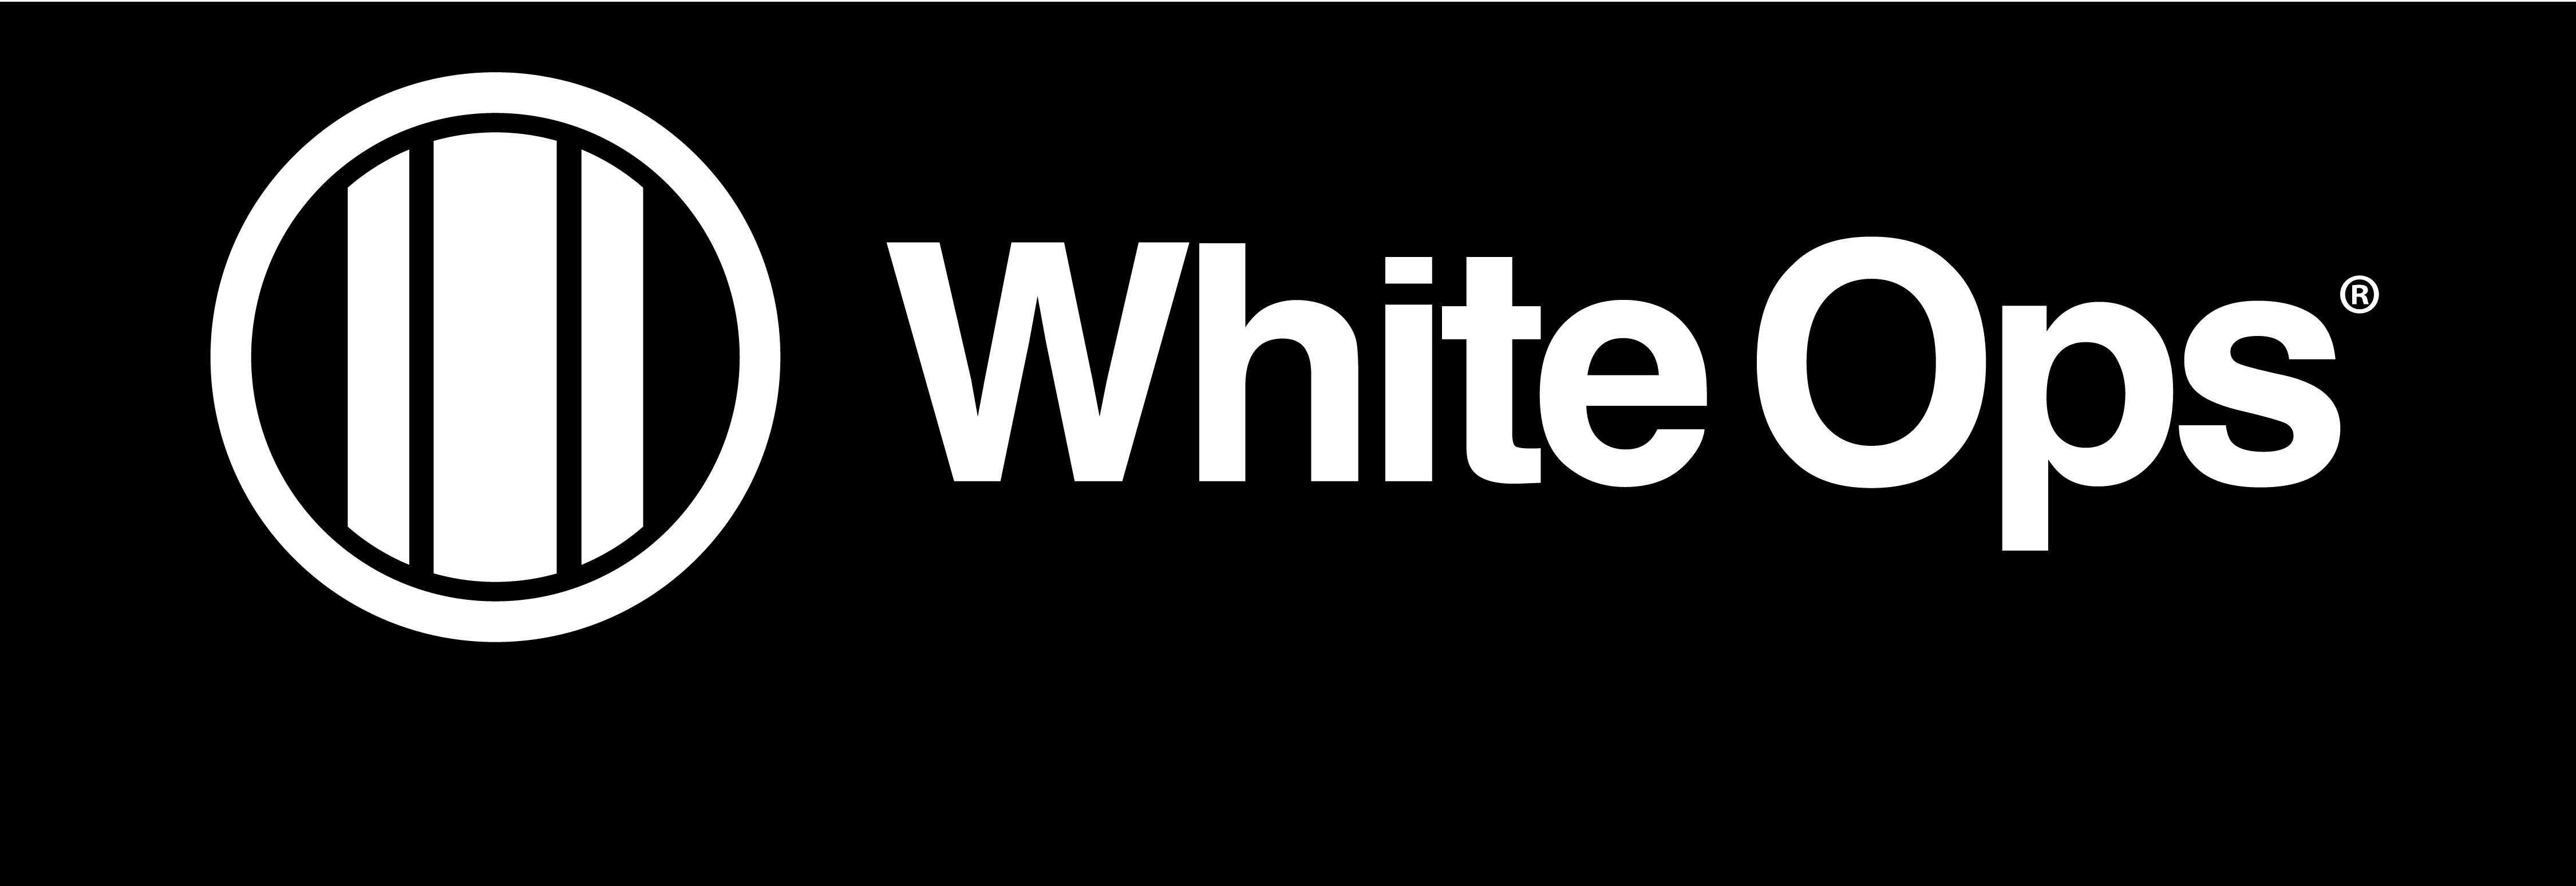 whiteops